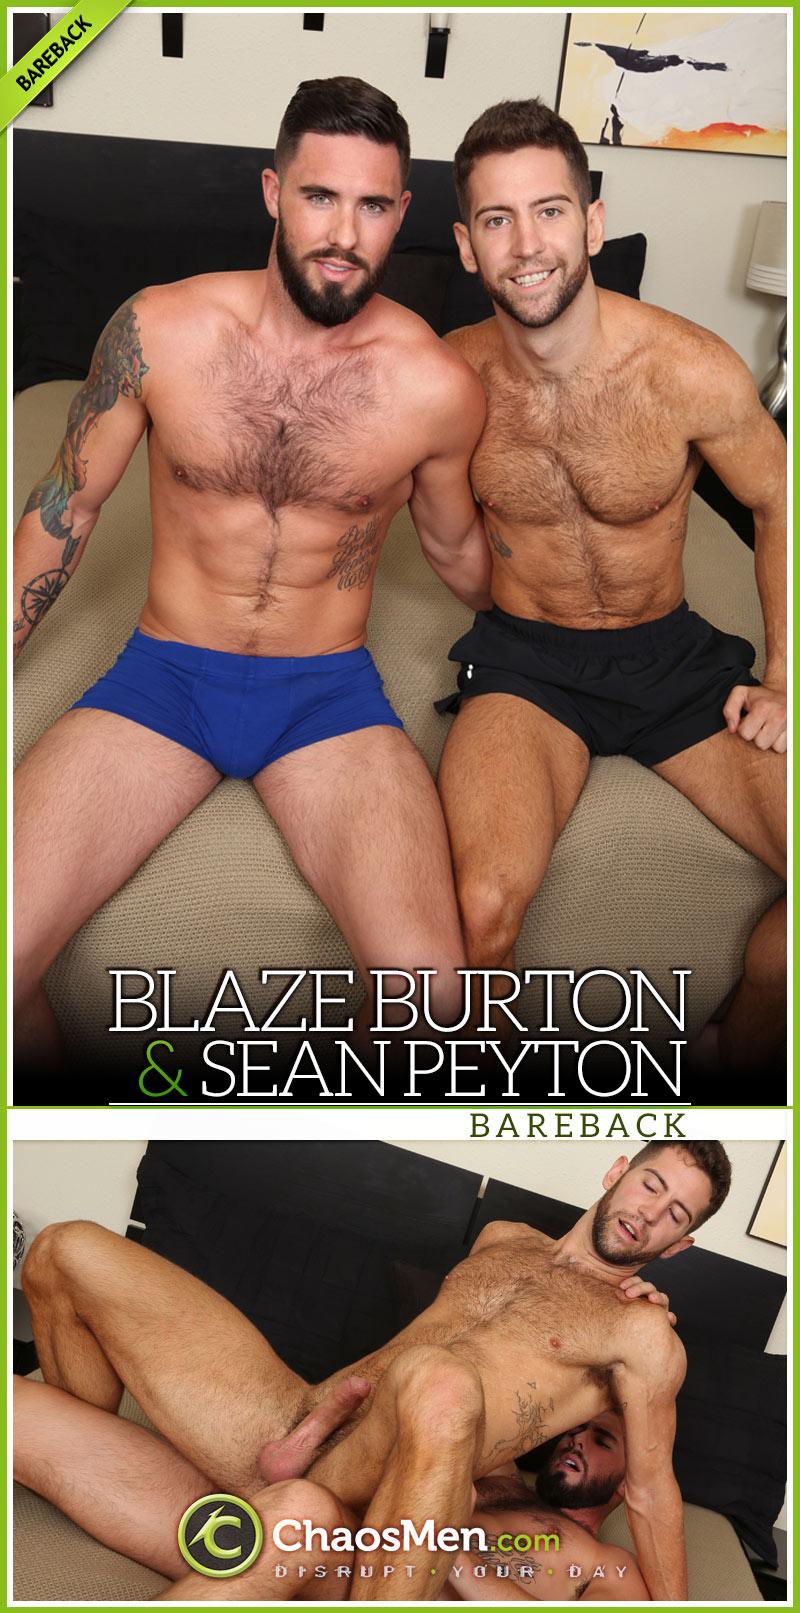 Blaze Burton Fucks Sean Peyton at ChaosMen